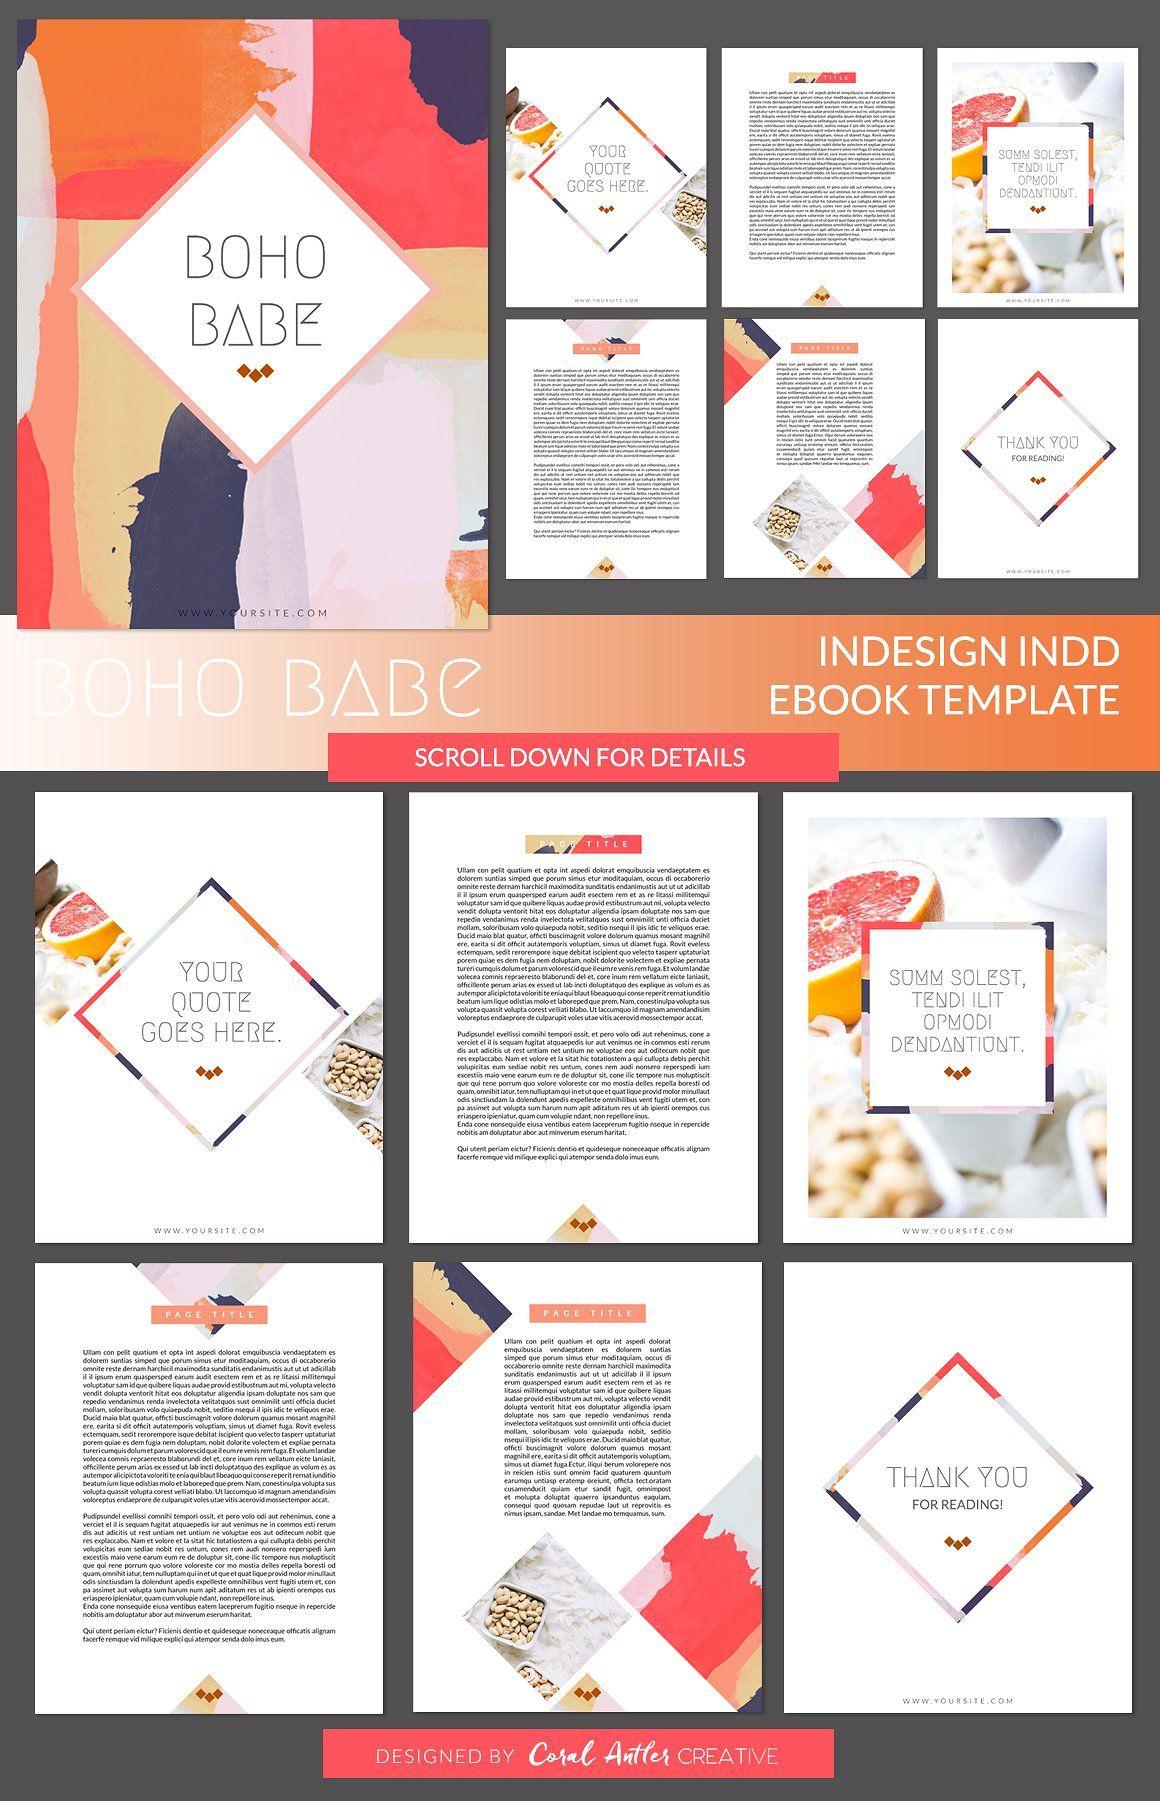 Boho Babe InDesign Ebook Template